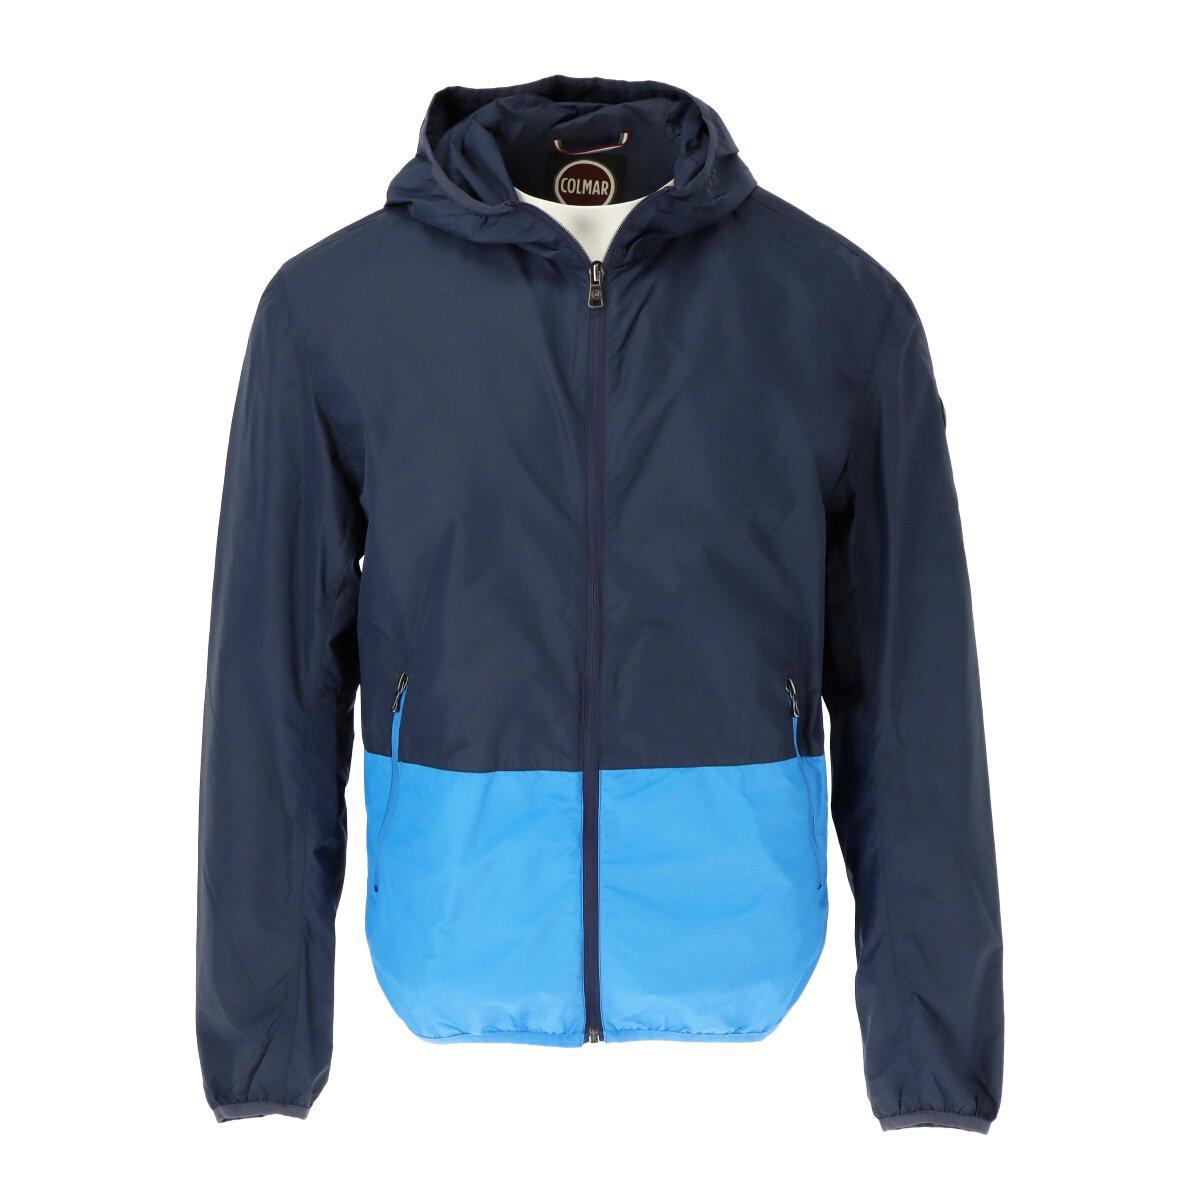 Colmar Men's Jacket Orange 196327 - blue 48